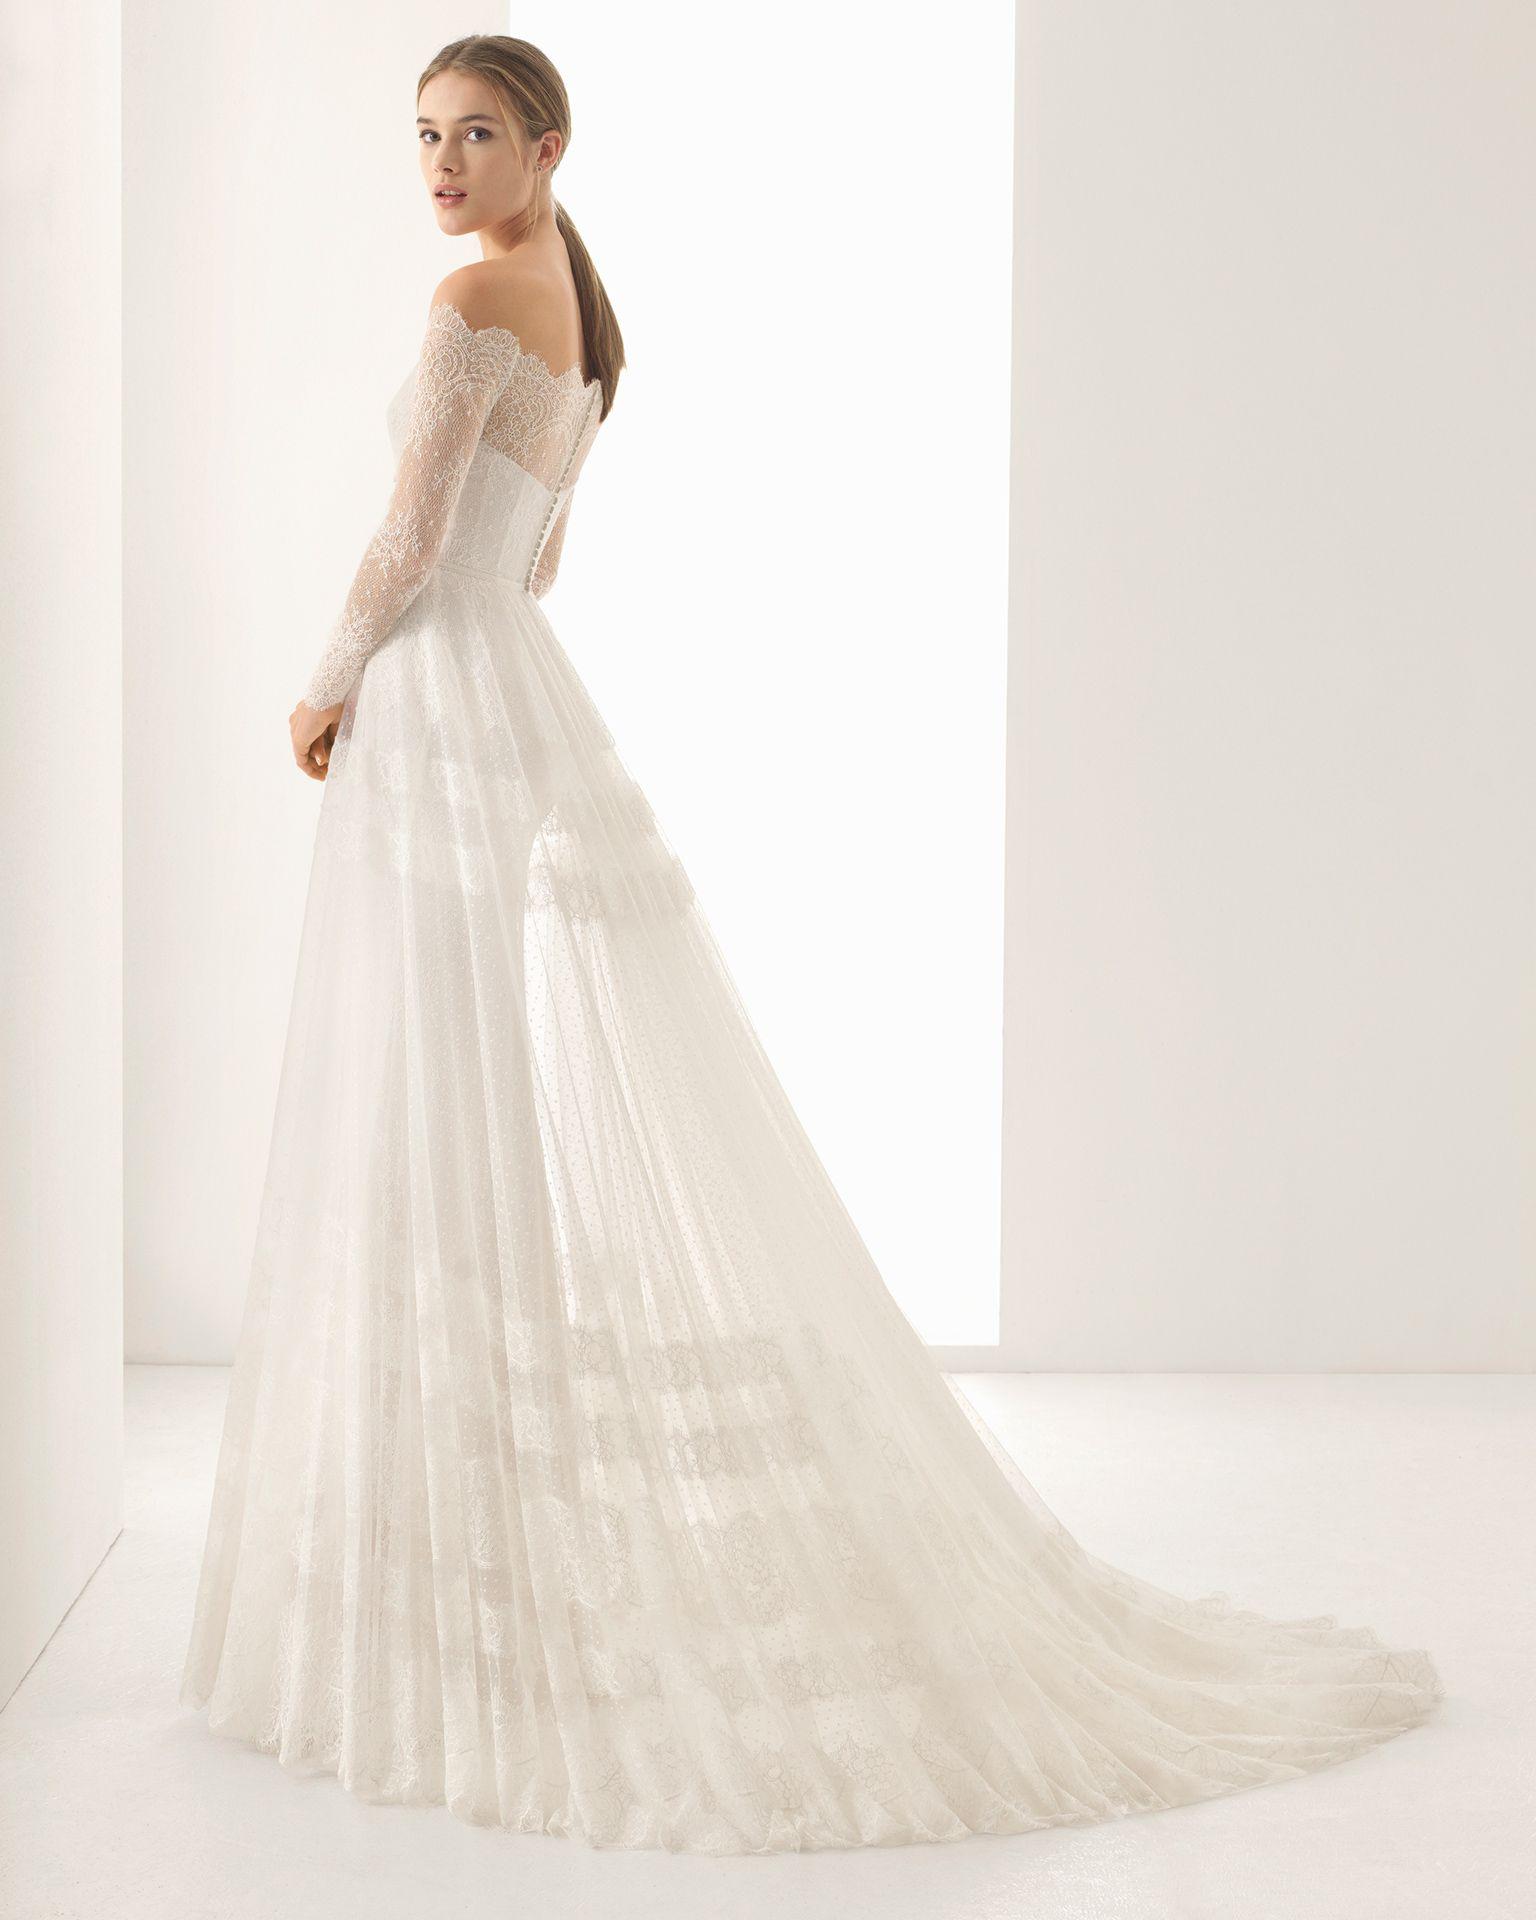 PARIS - Hochzeit 2018. Kollektion Rosa Clará Couture   Rosa clará ...